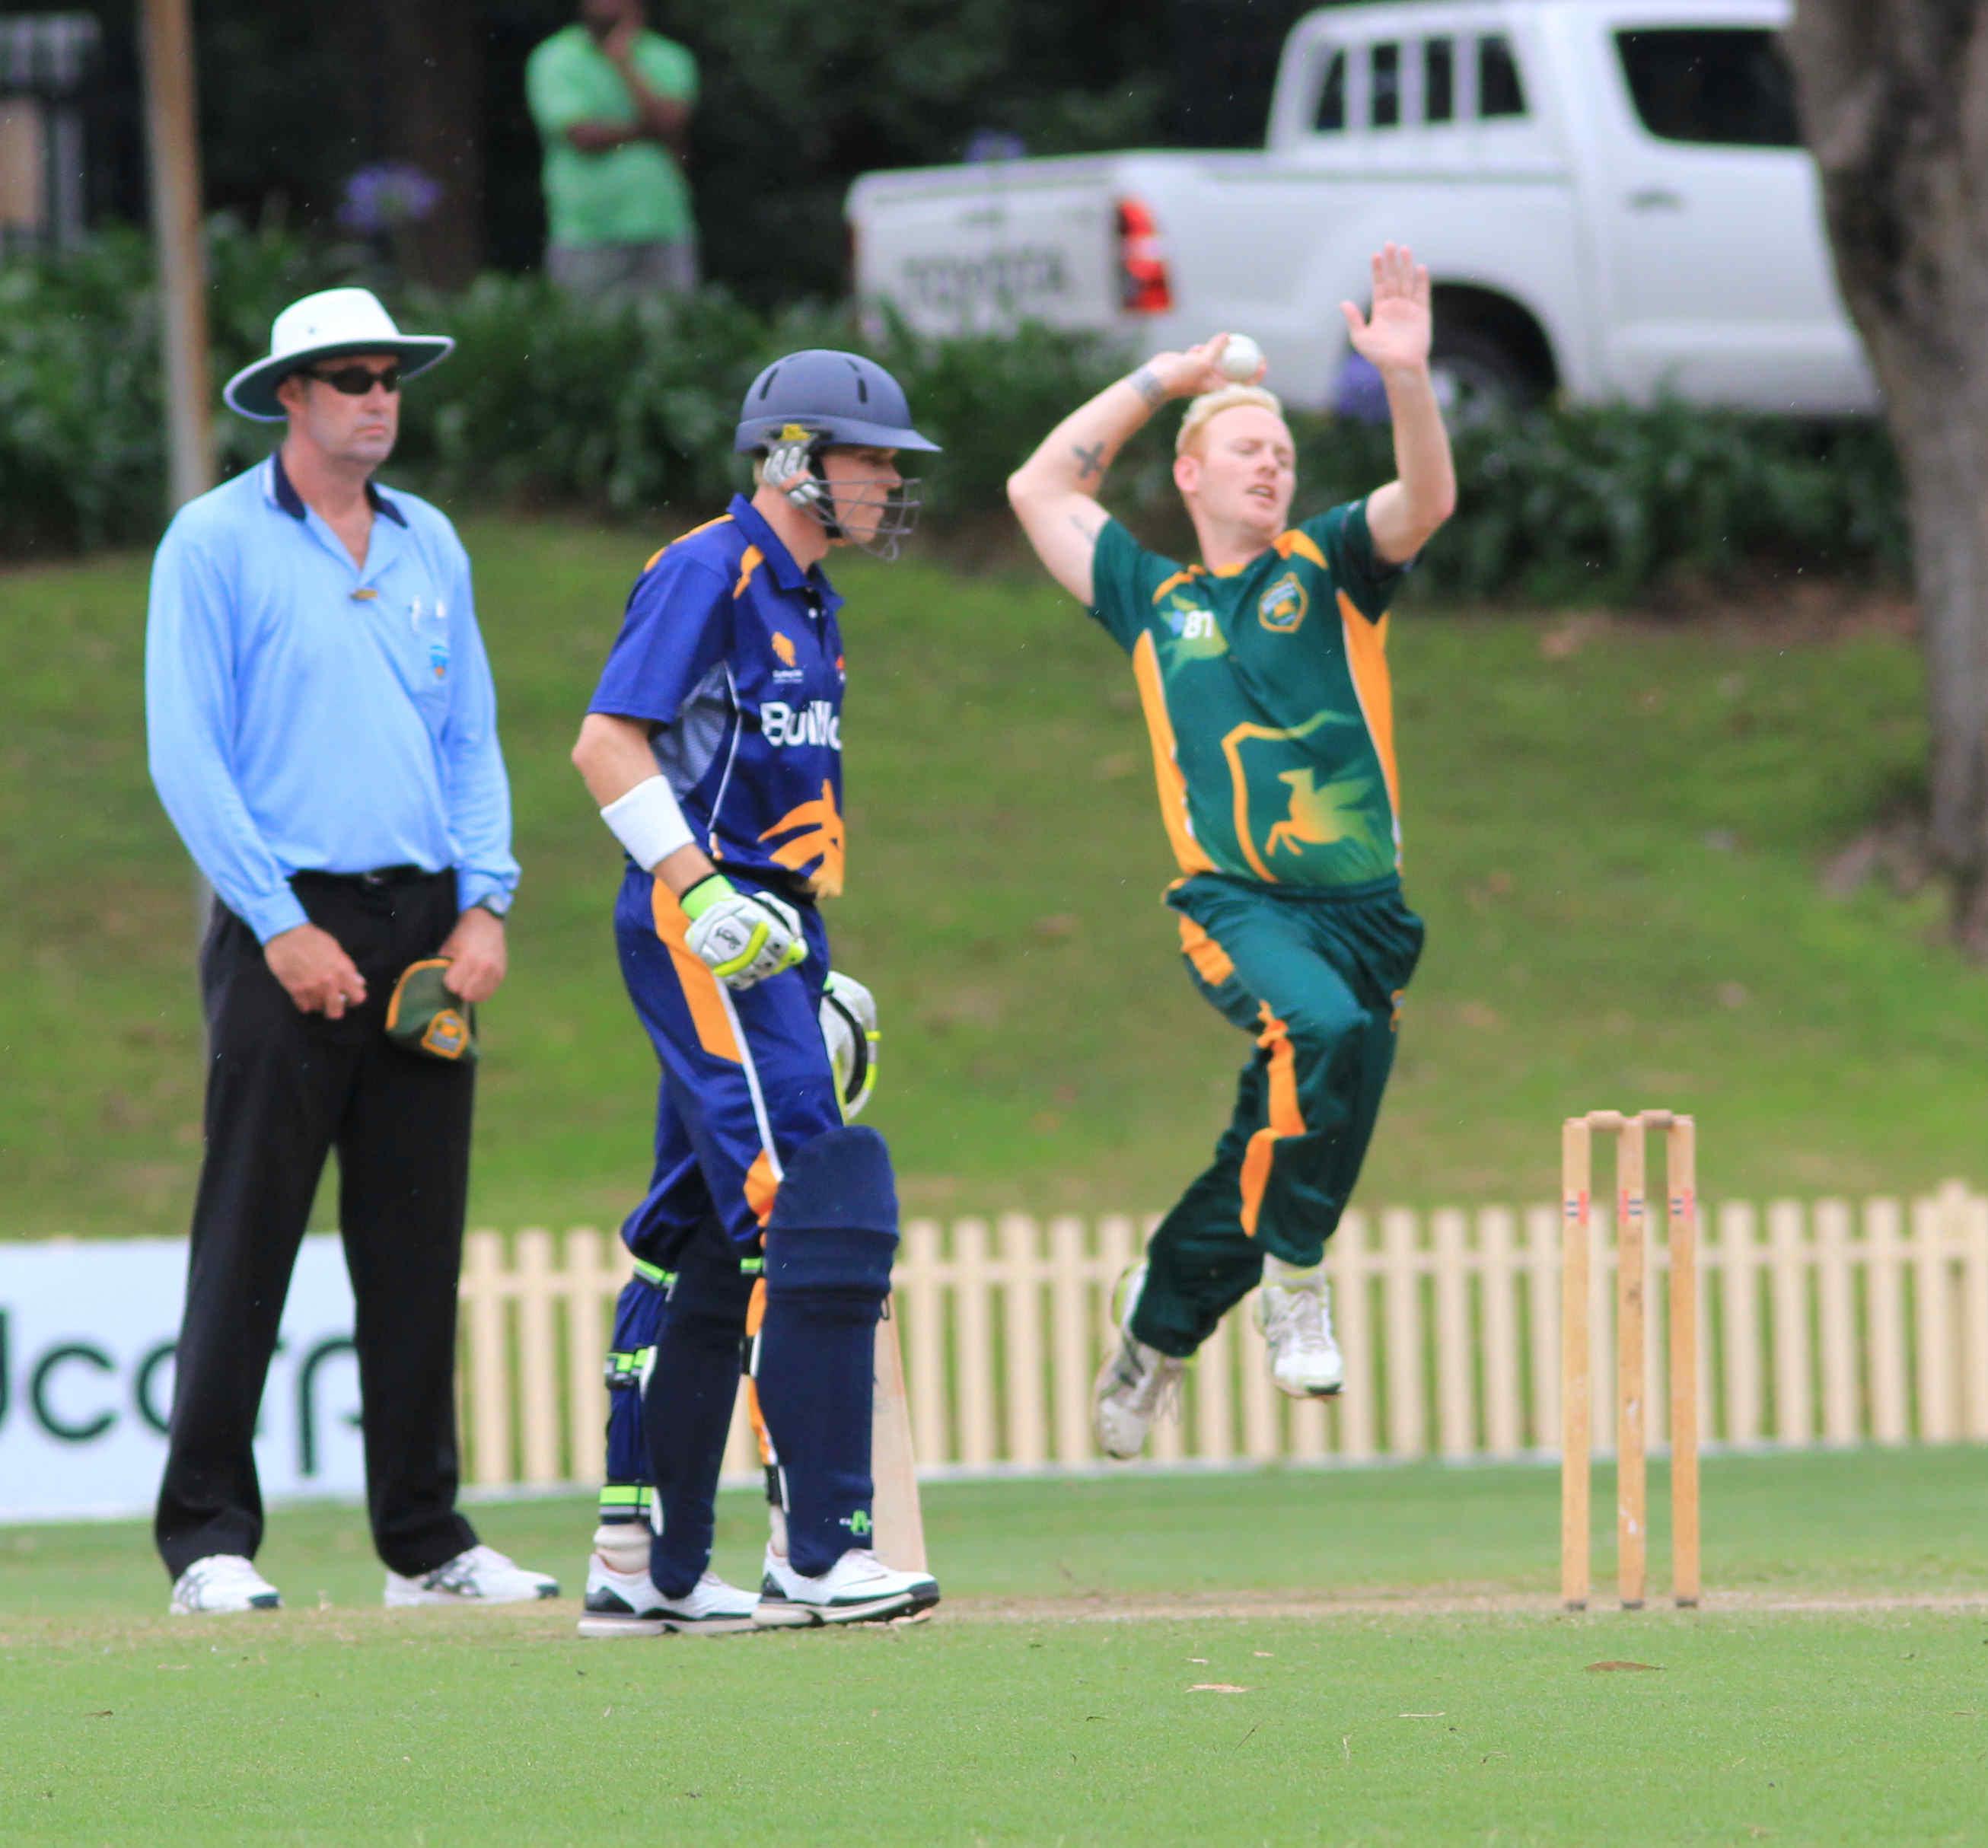 Scott Coyte - NSW Cap #704